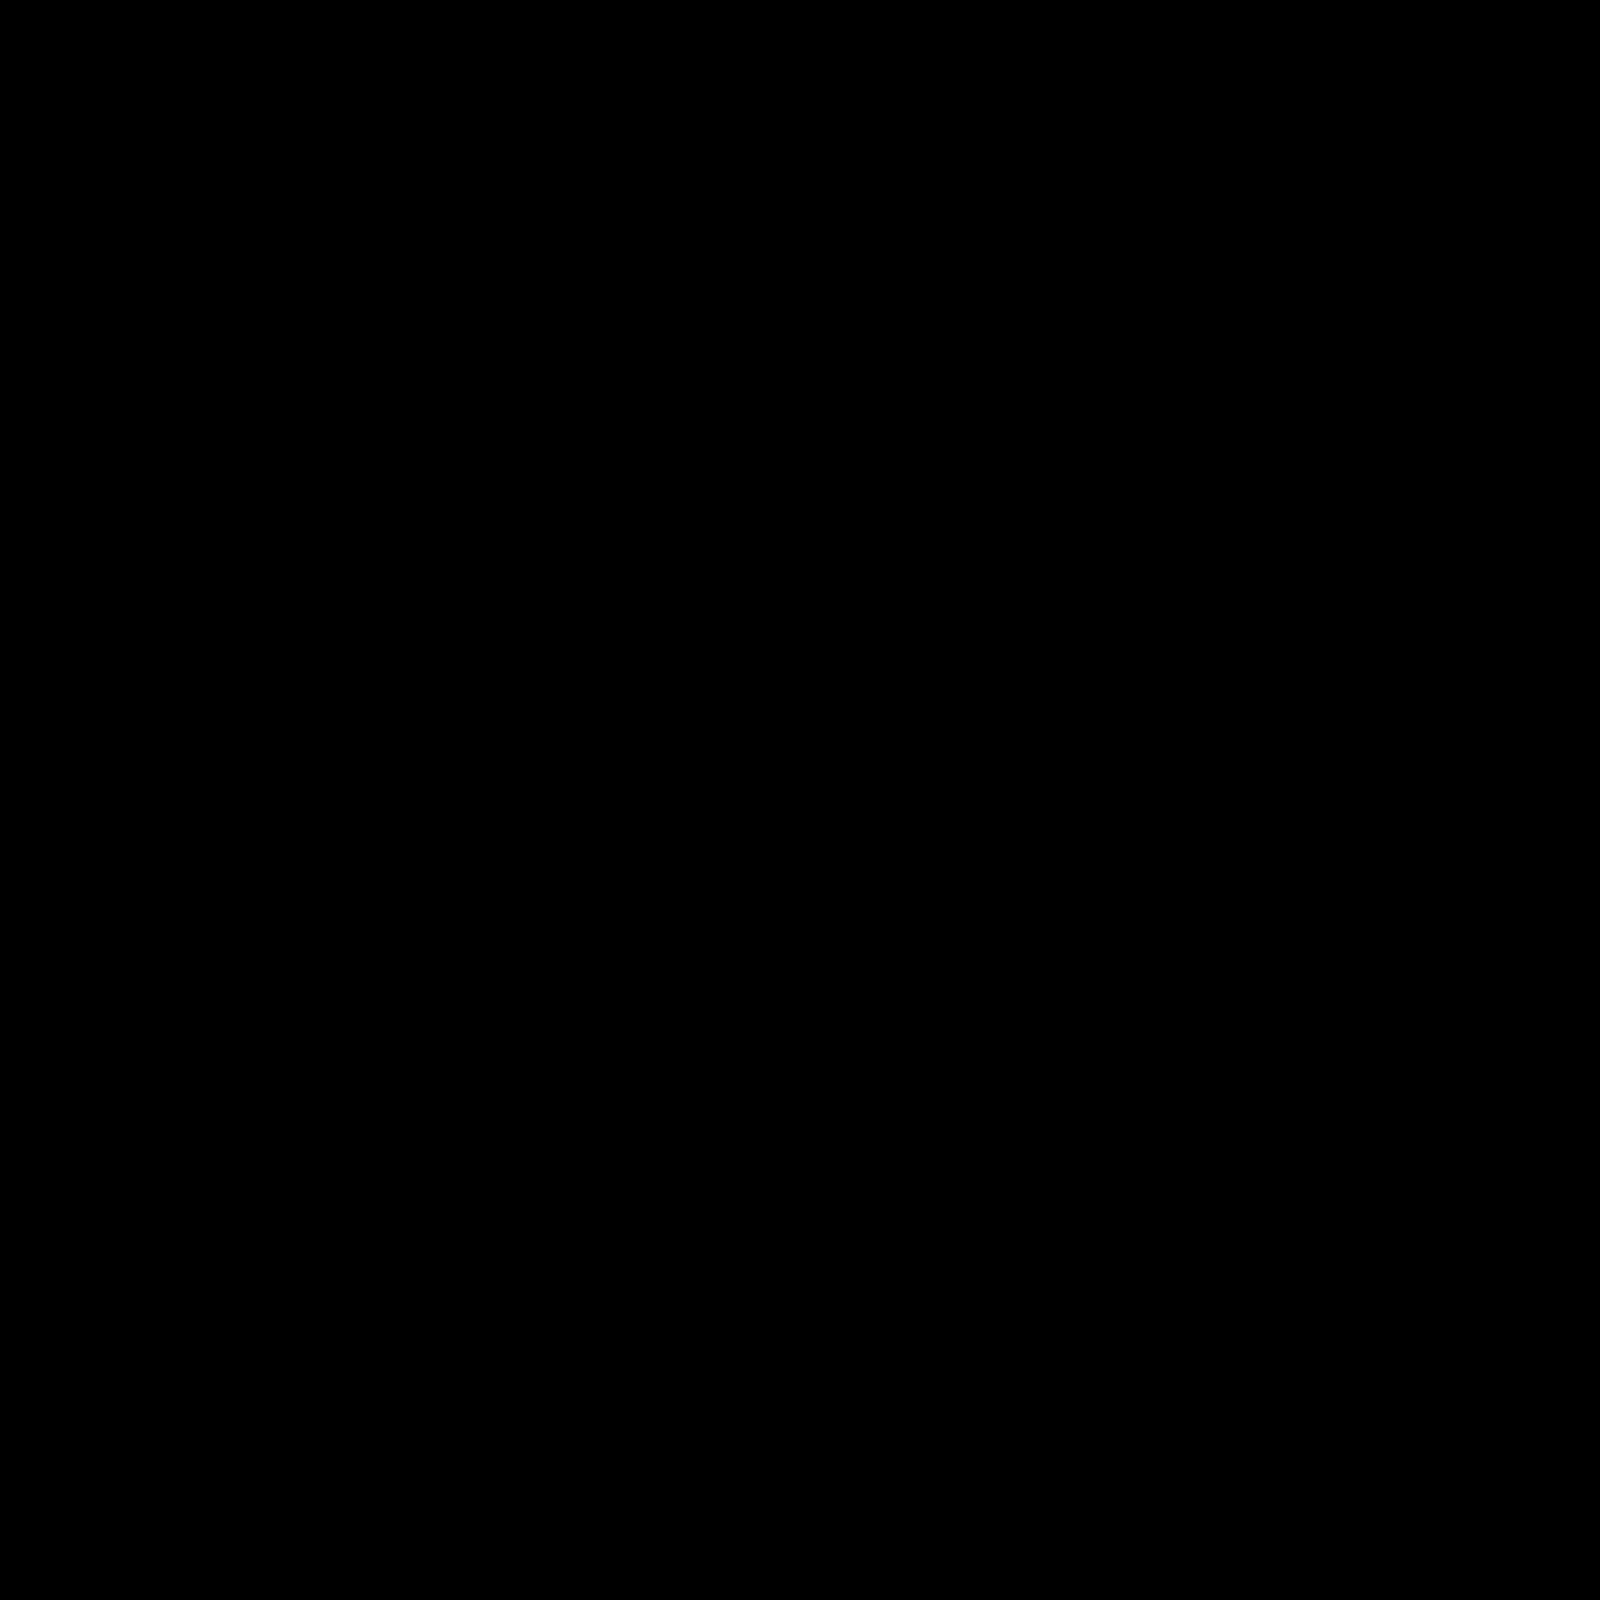 Folder wypalania icon